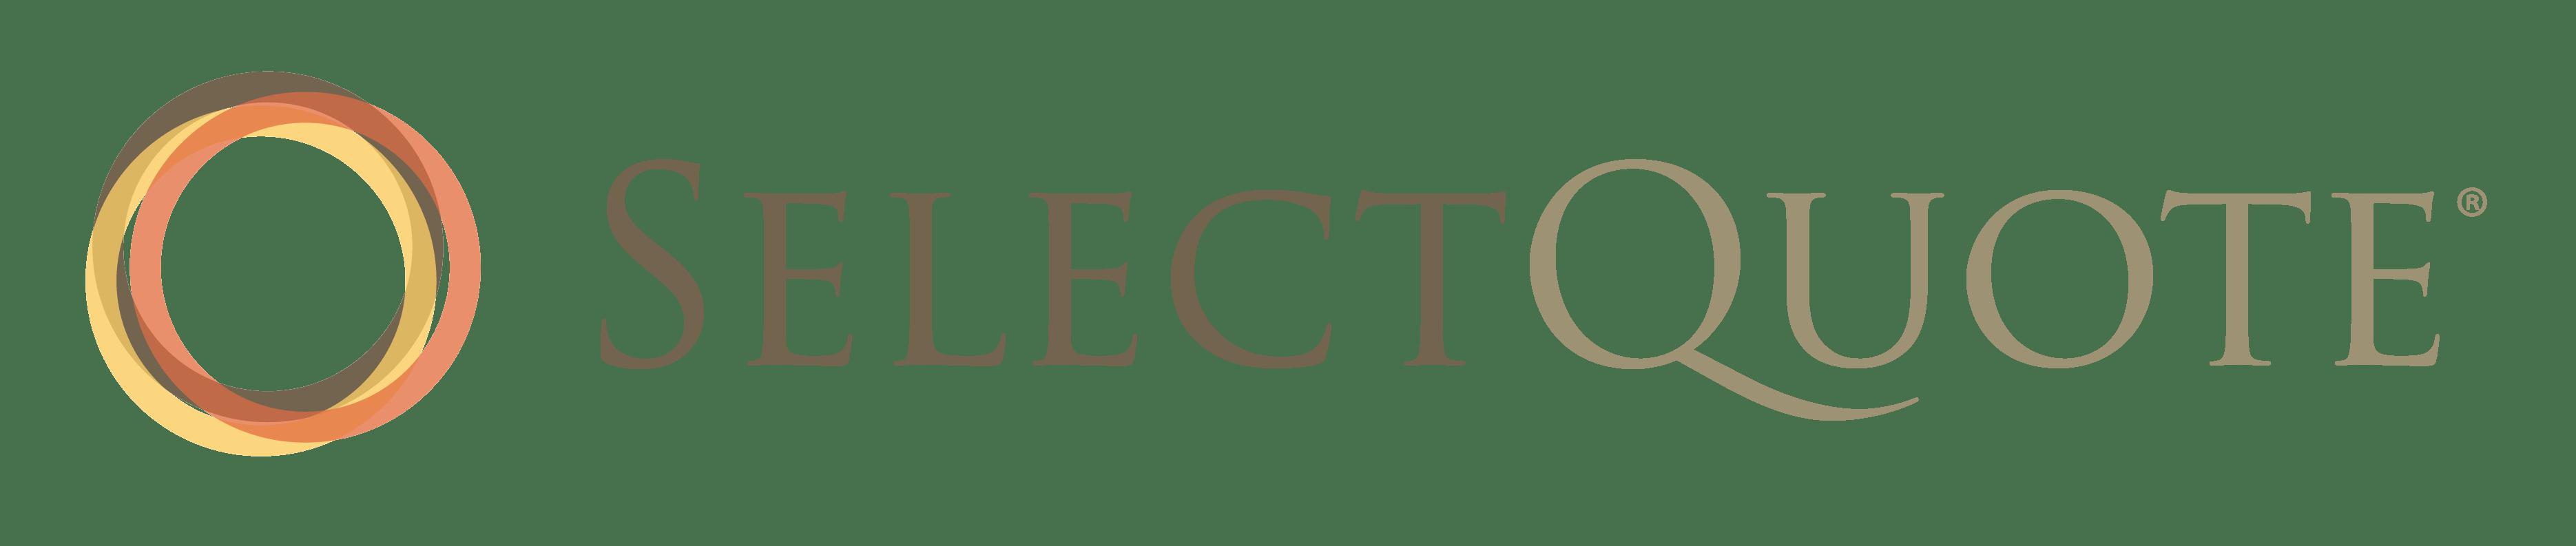 ІРО SelectQuote, Inc (SLQT)